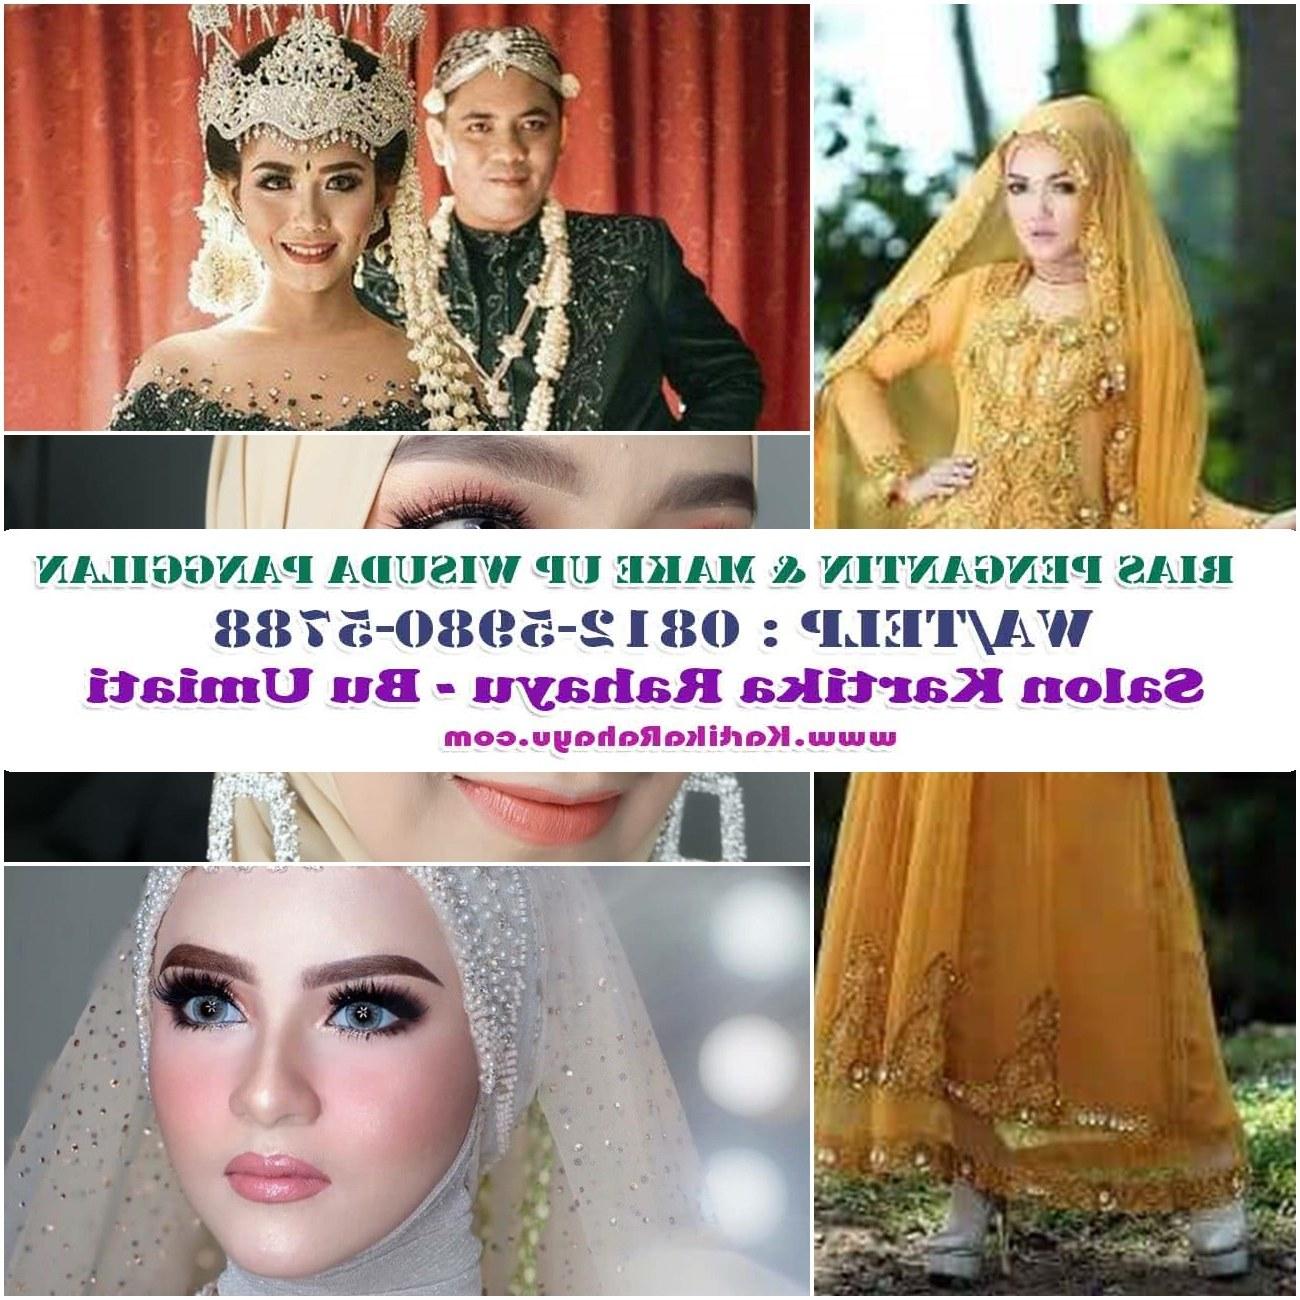 Design Sewa Baju Pengantin Muslimah Di Depok Rldj Rias Pengantin Terbaik Di Malang